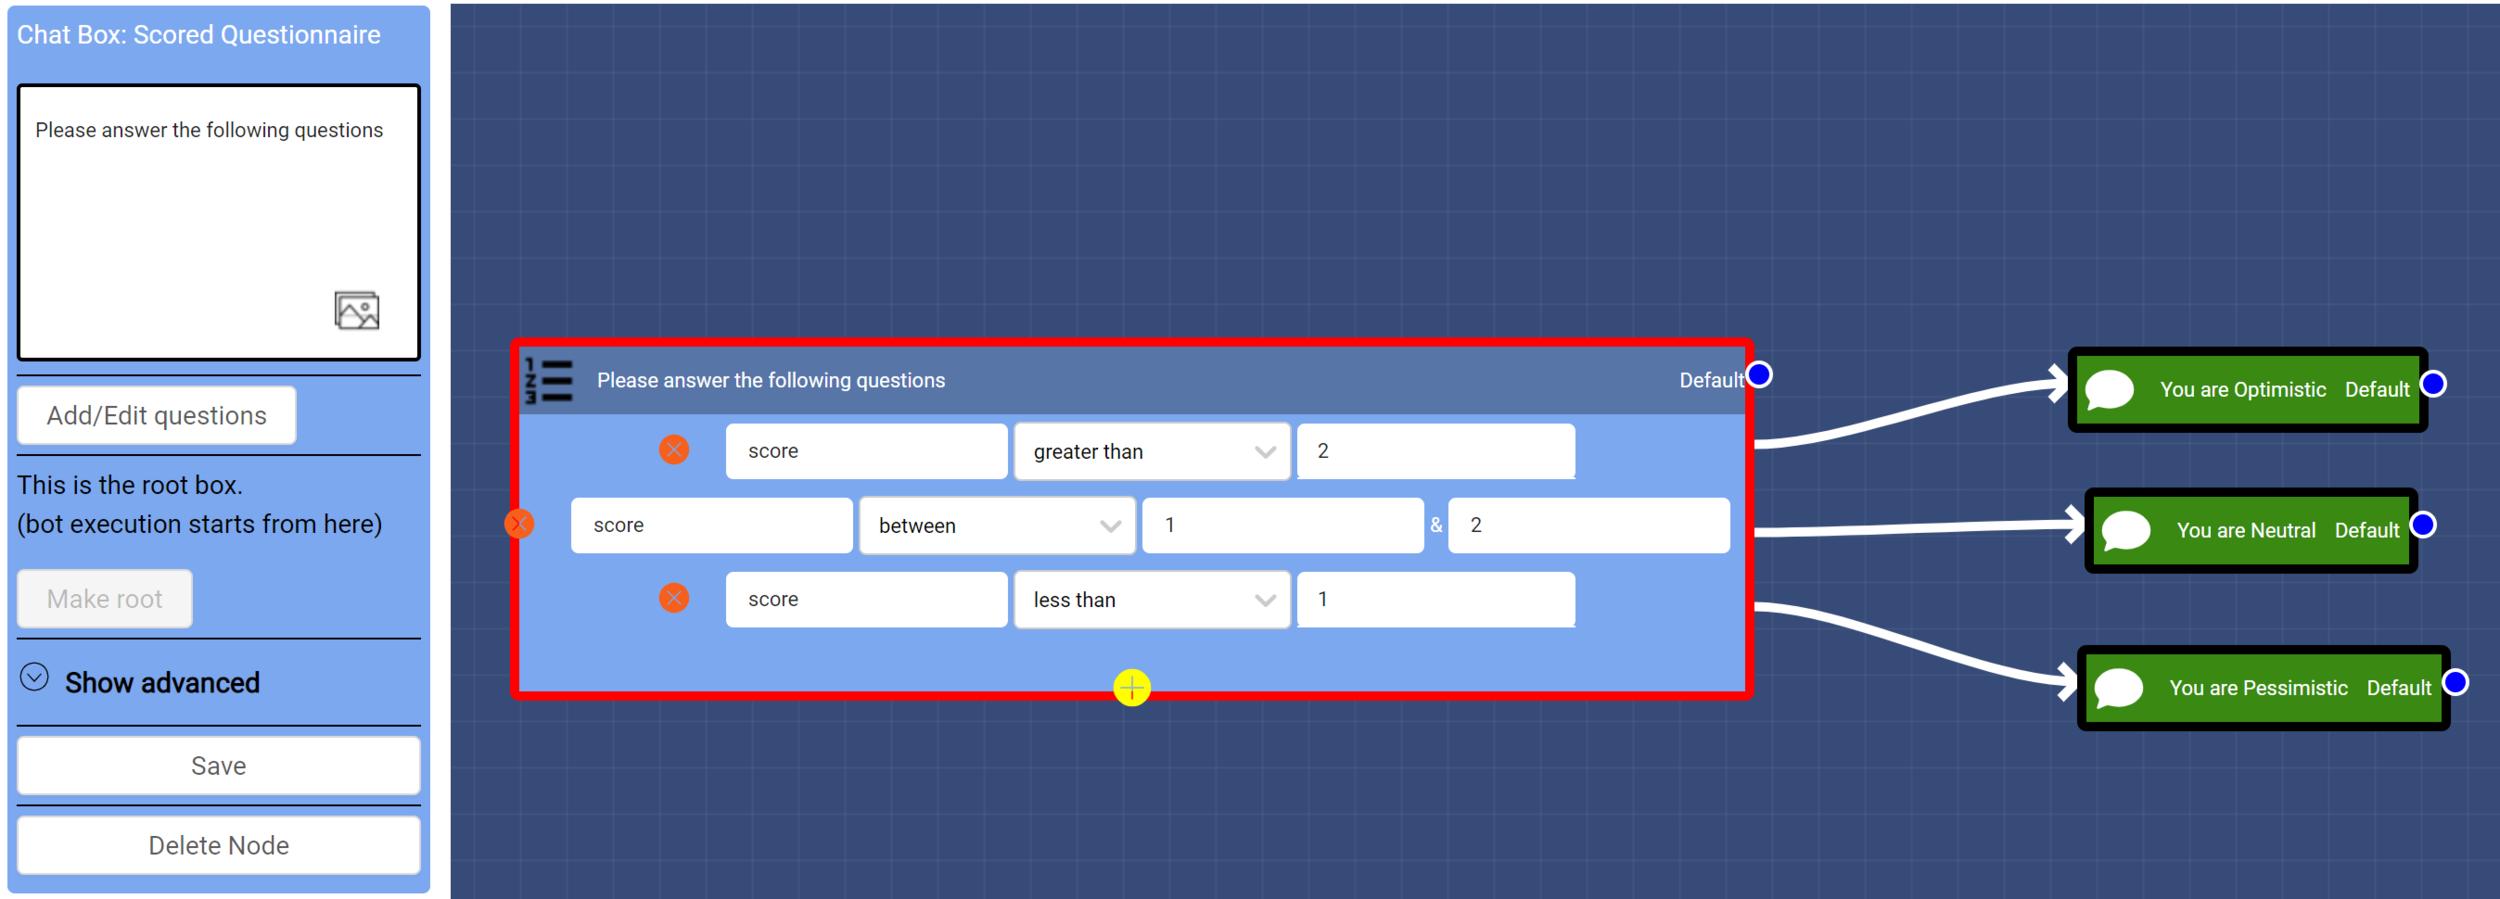 Create Flow Diagram Bot — Healthcare Marketing | Patient